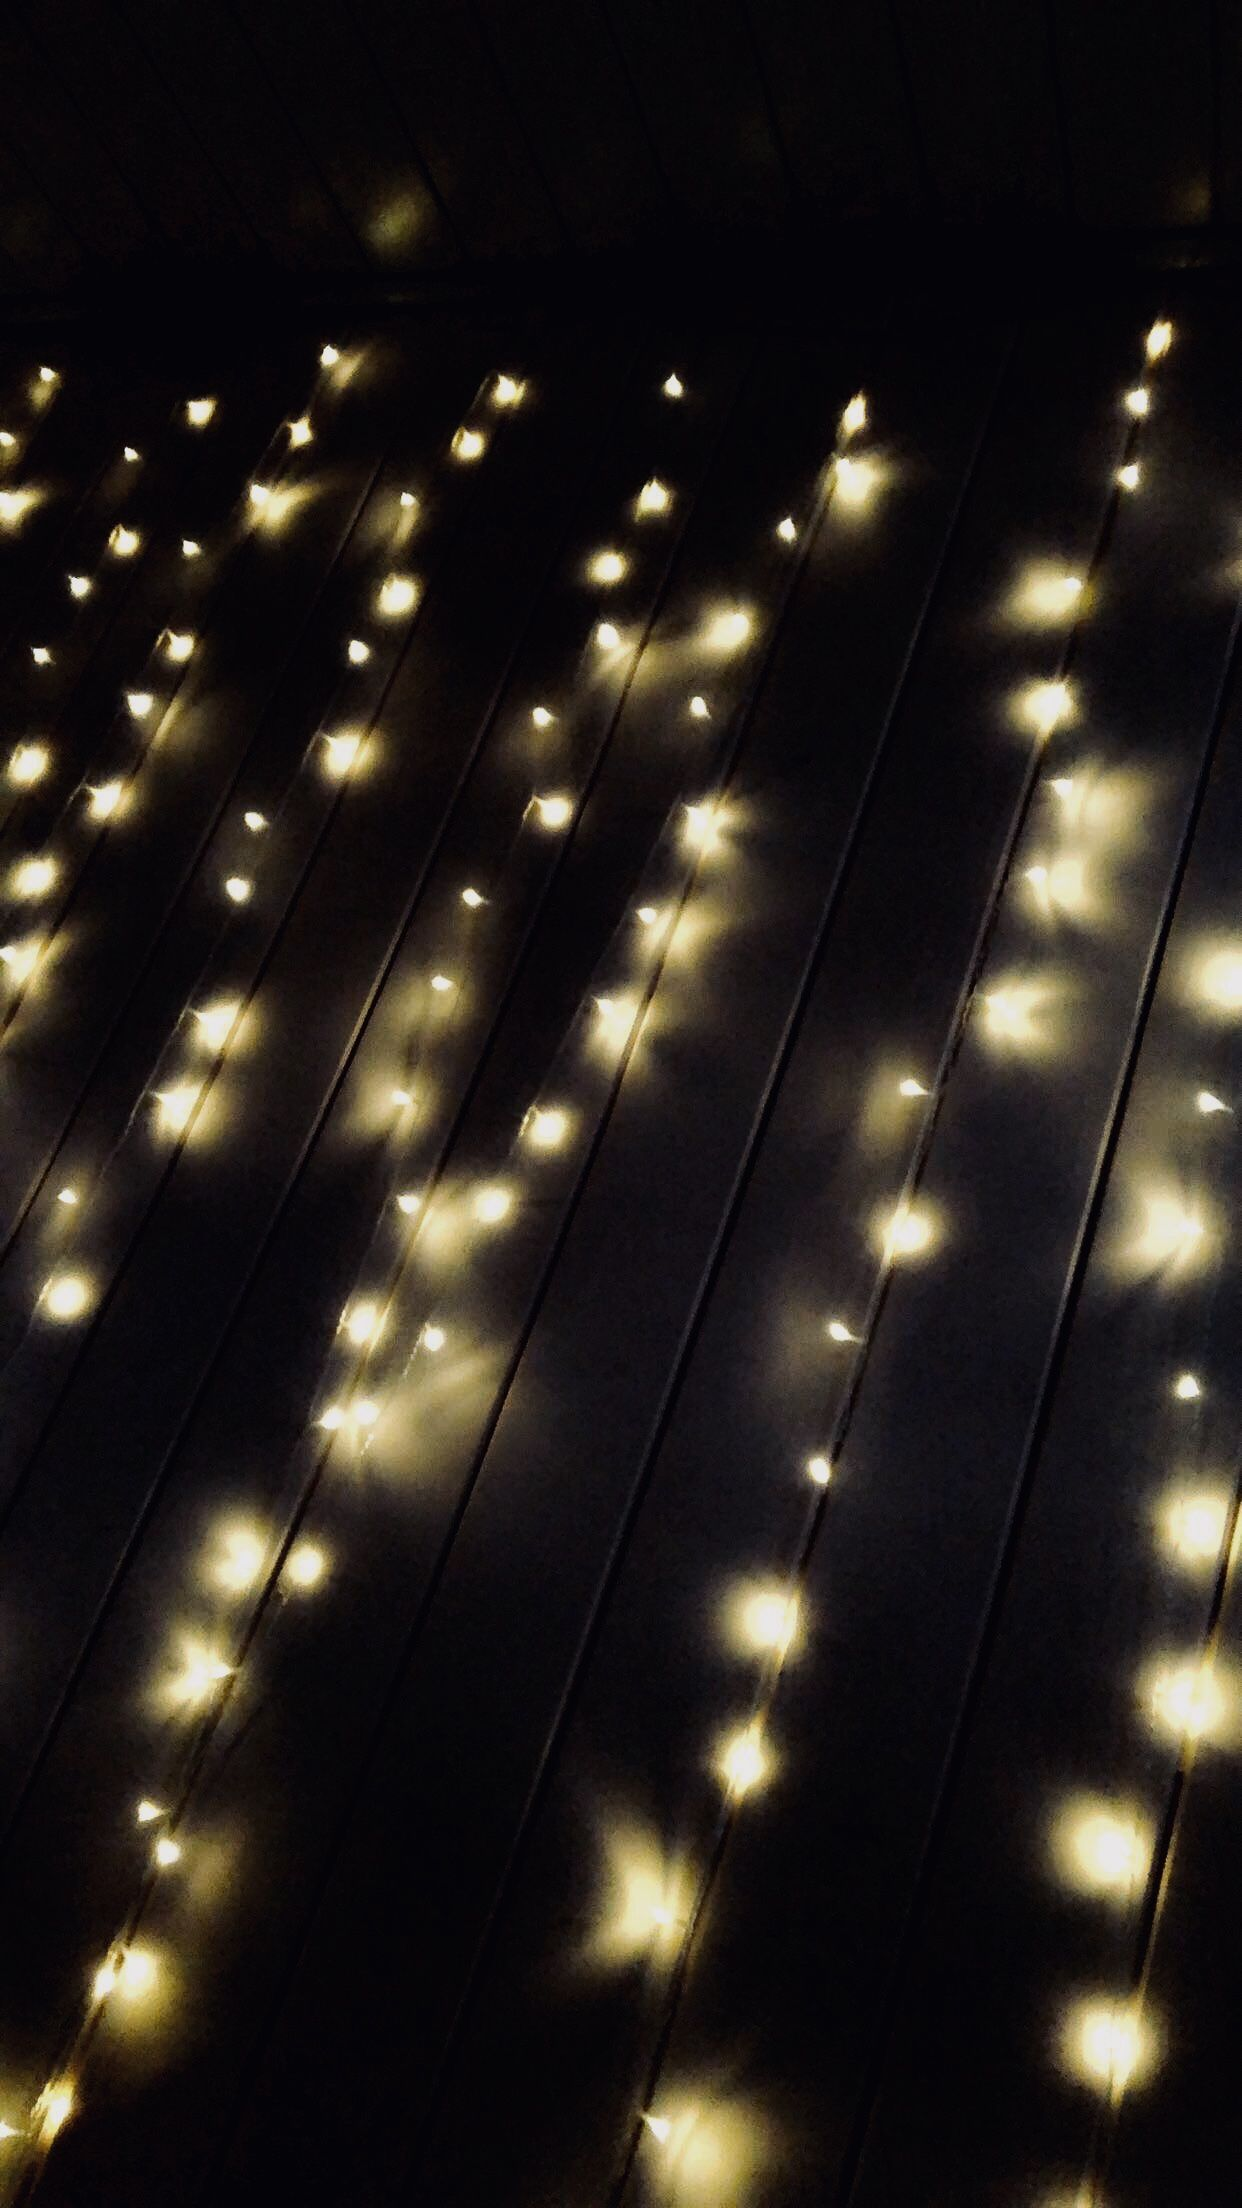 Aesthetic Lights Black Yellow Color Yellow Aesthetic Black Aesthetic Aesthetic Pictures